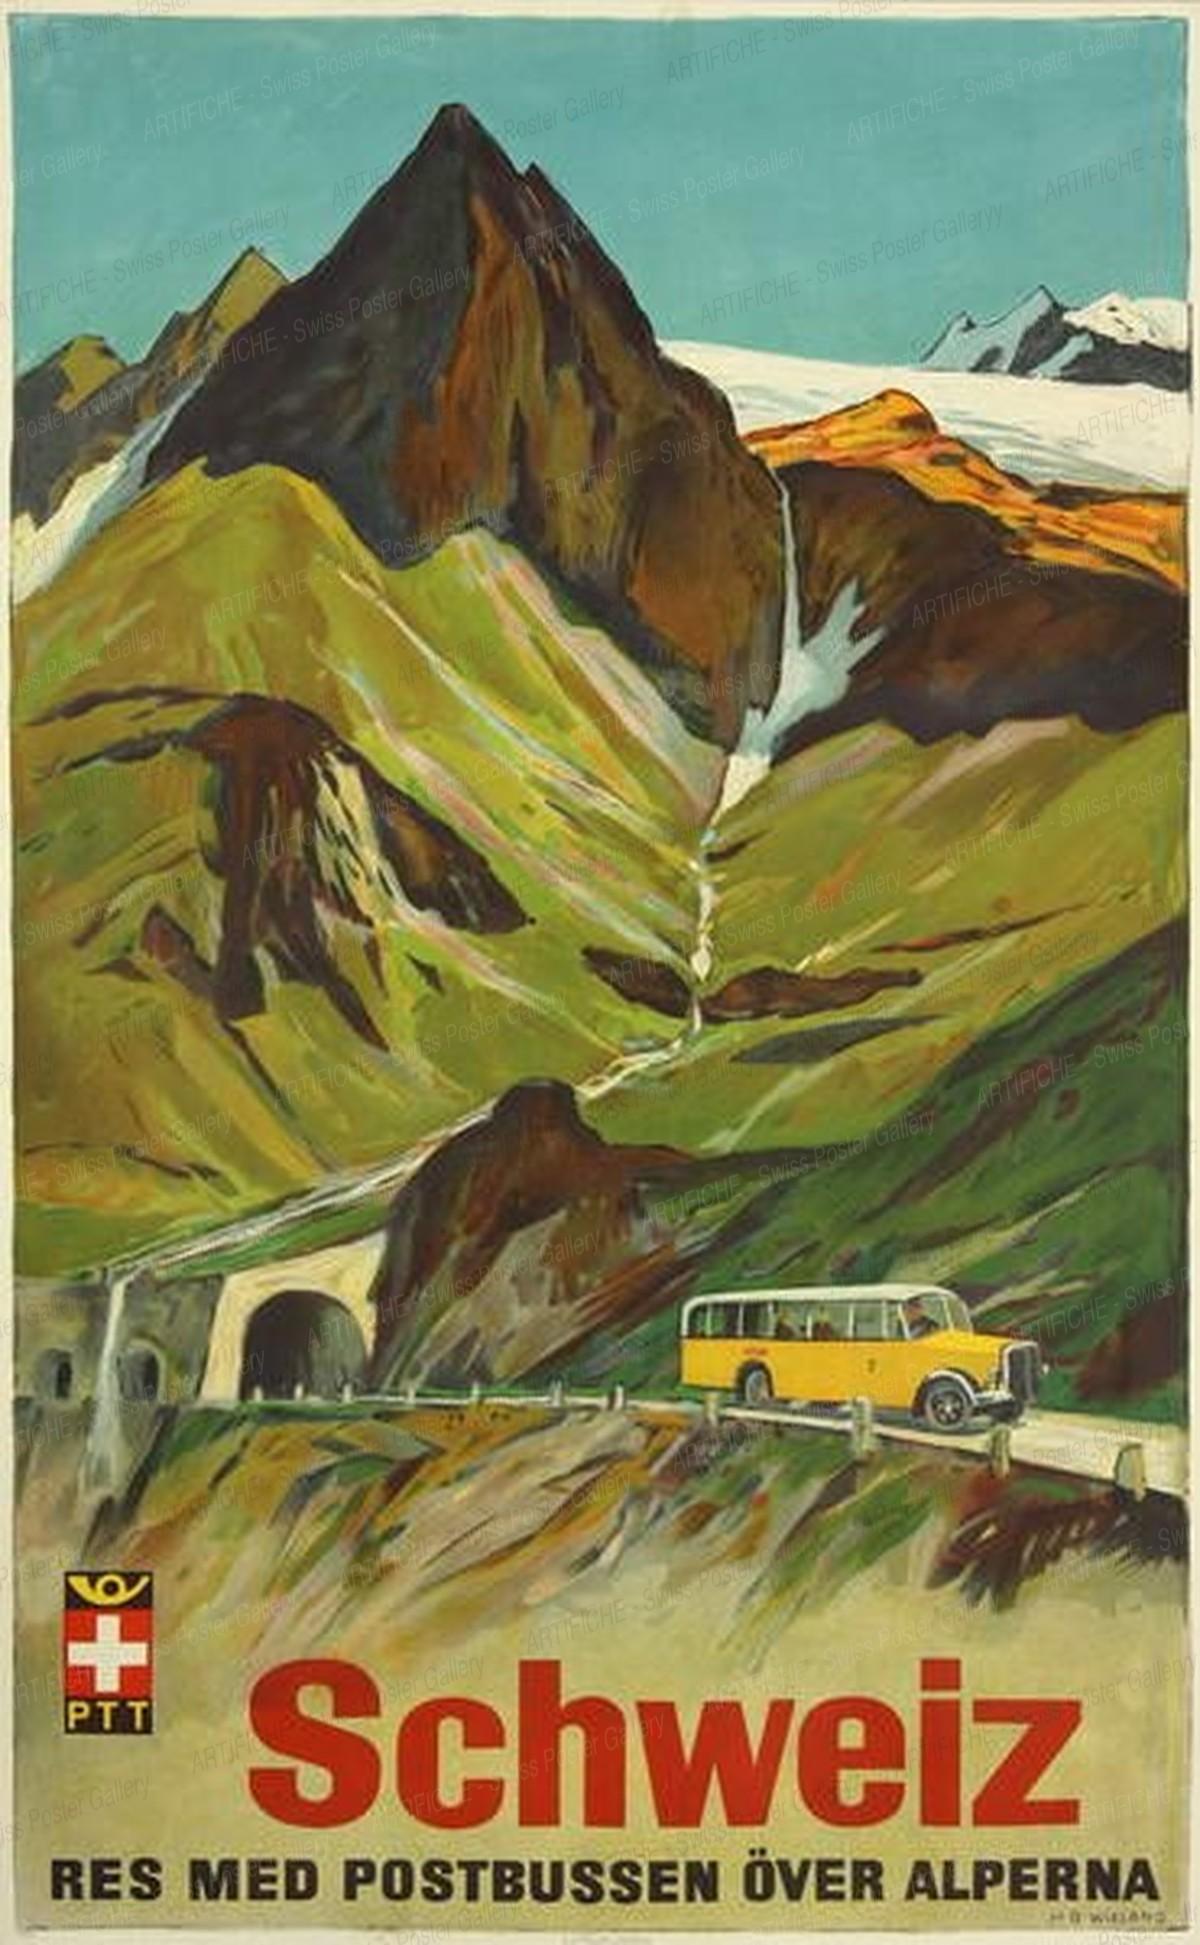 Schweiz – Res med postbussen över alperna, Hans Beat Wieland